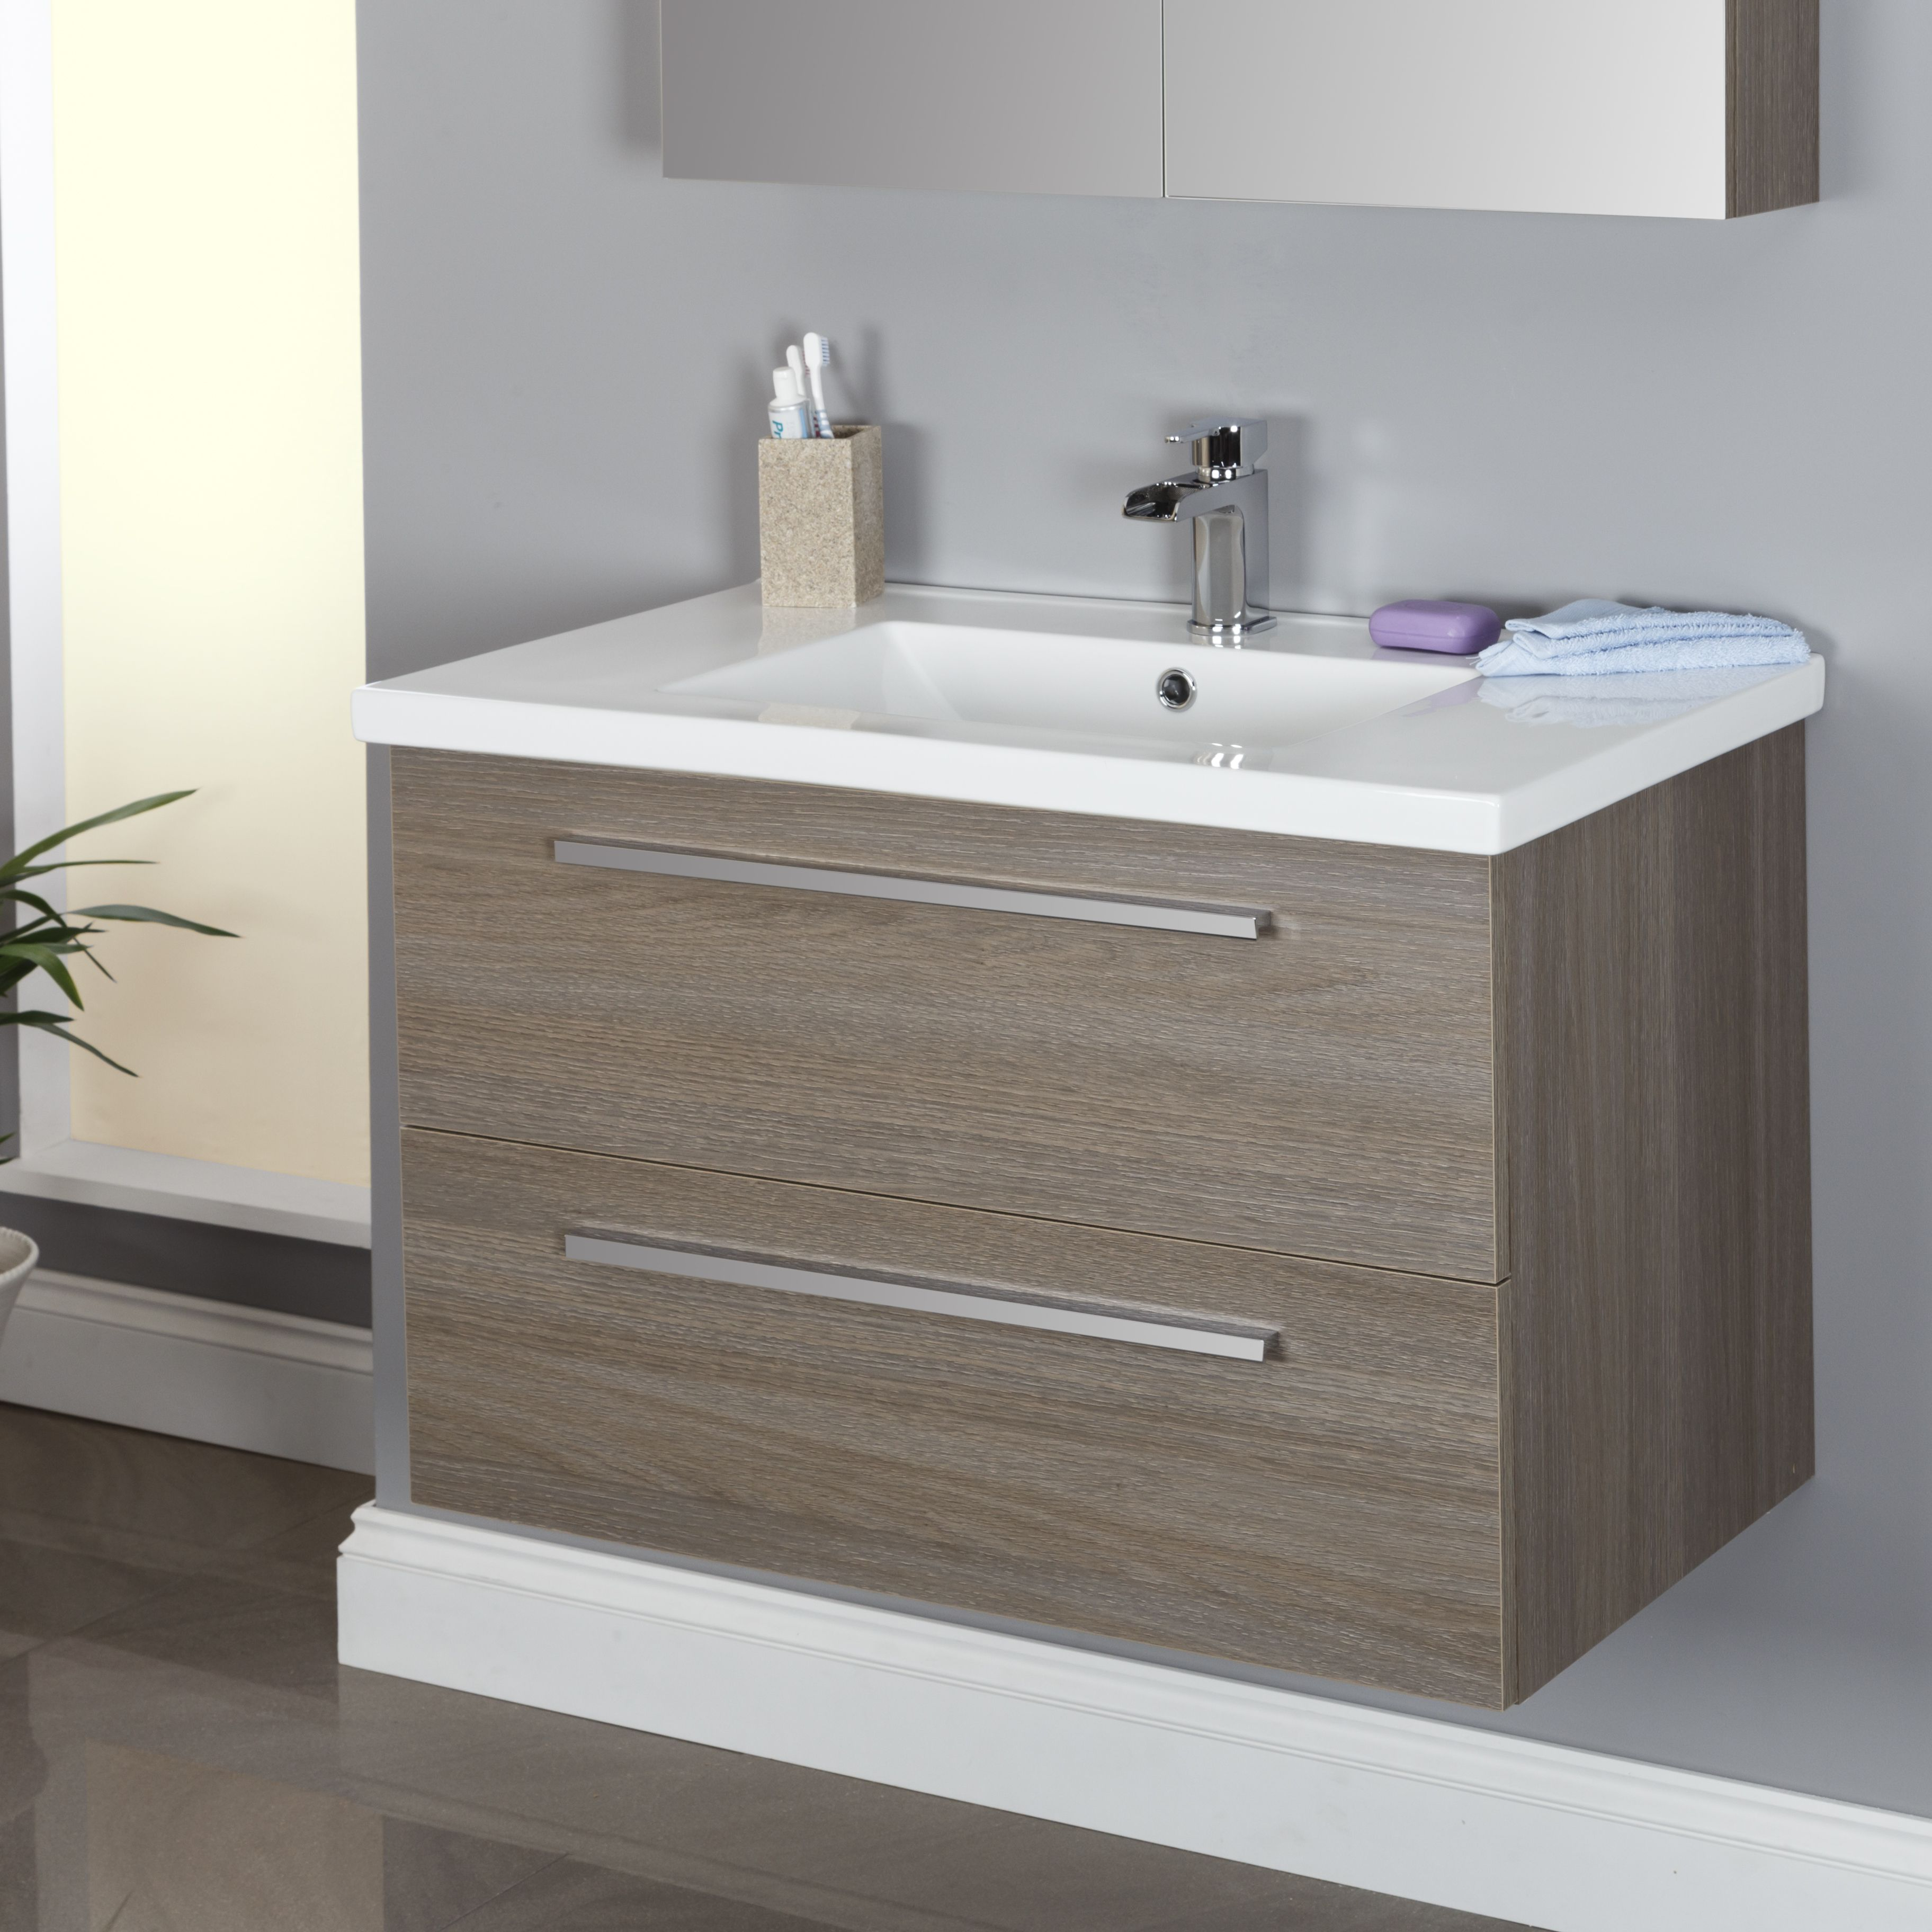 Vasari wall hung vanity unit basin grey oak 800mm - Best prices for bathroom vanities ...